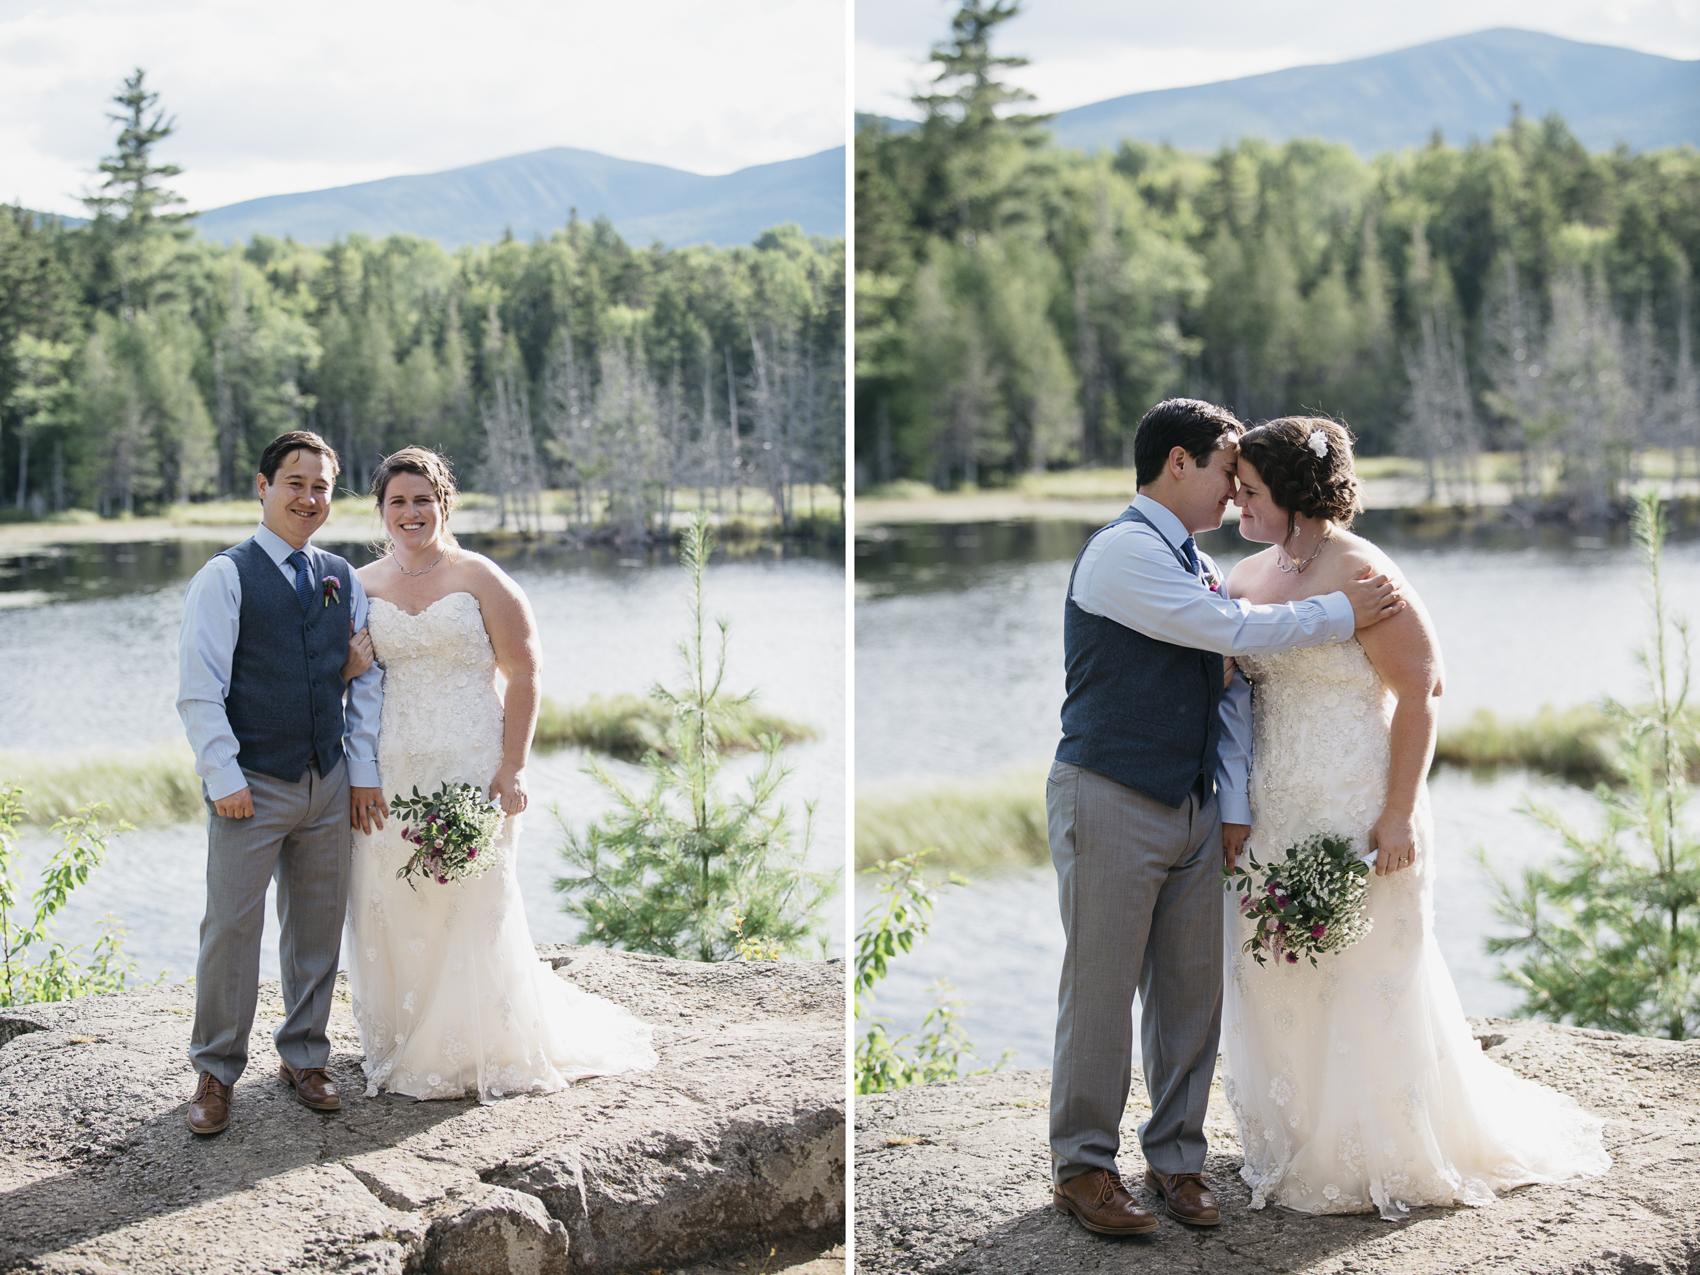 LFA_JuliaGlenn_Sugarloaf_Maine_Wedding014.jpg